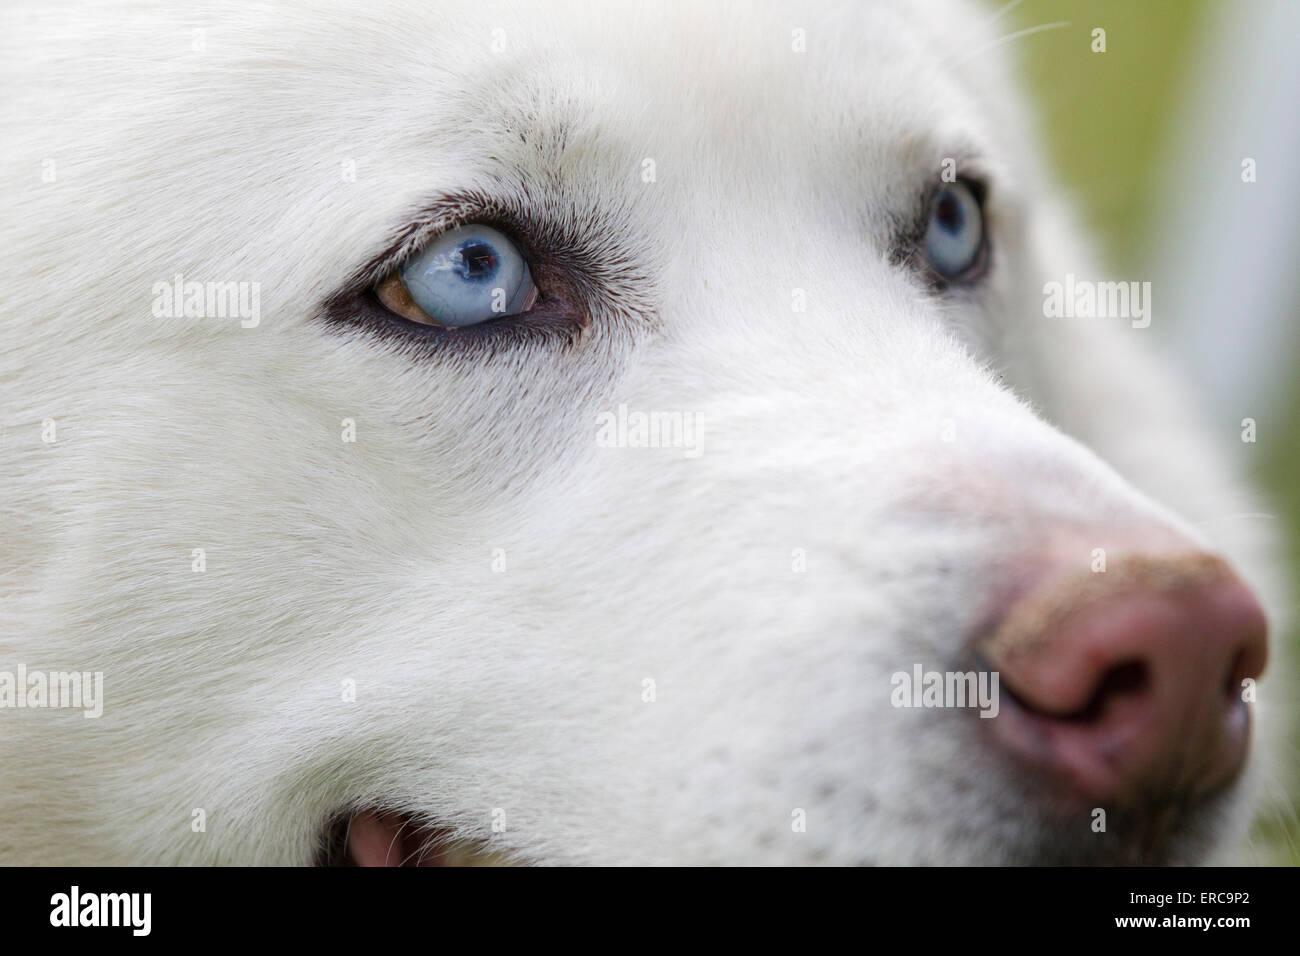 close up schuss husky hunde blaue augen sch ne wei e siberian husky hund portrait stockfoto. Black Bedroom Furniture Sets. Home Design Ideas